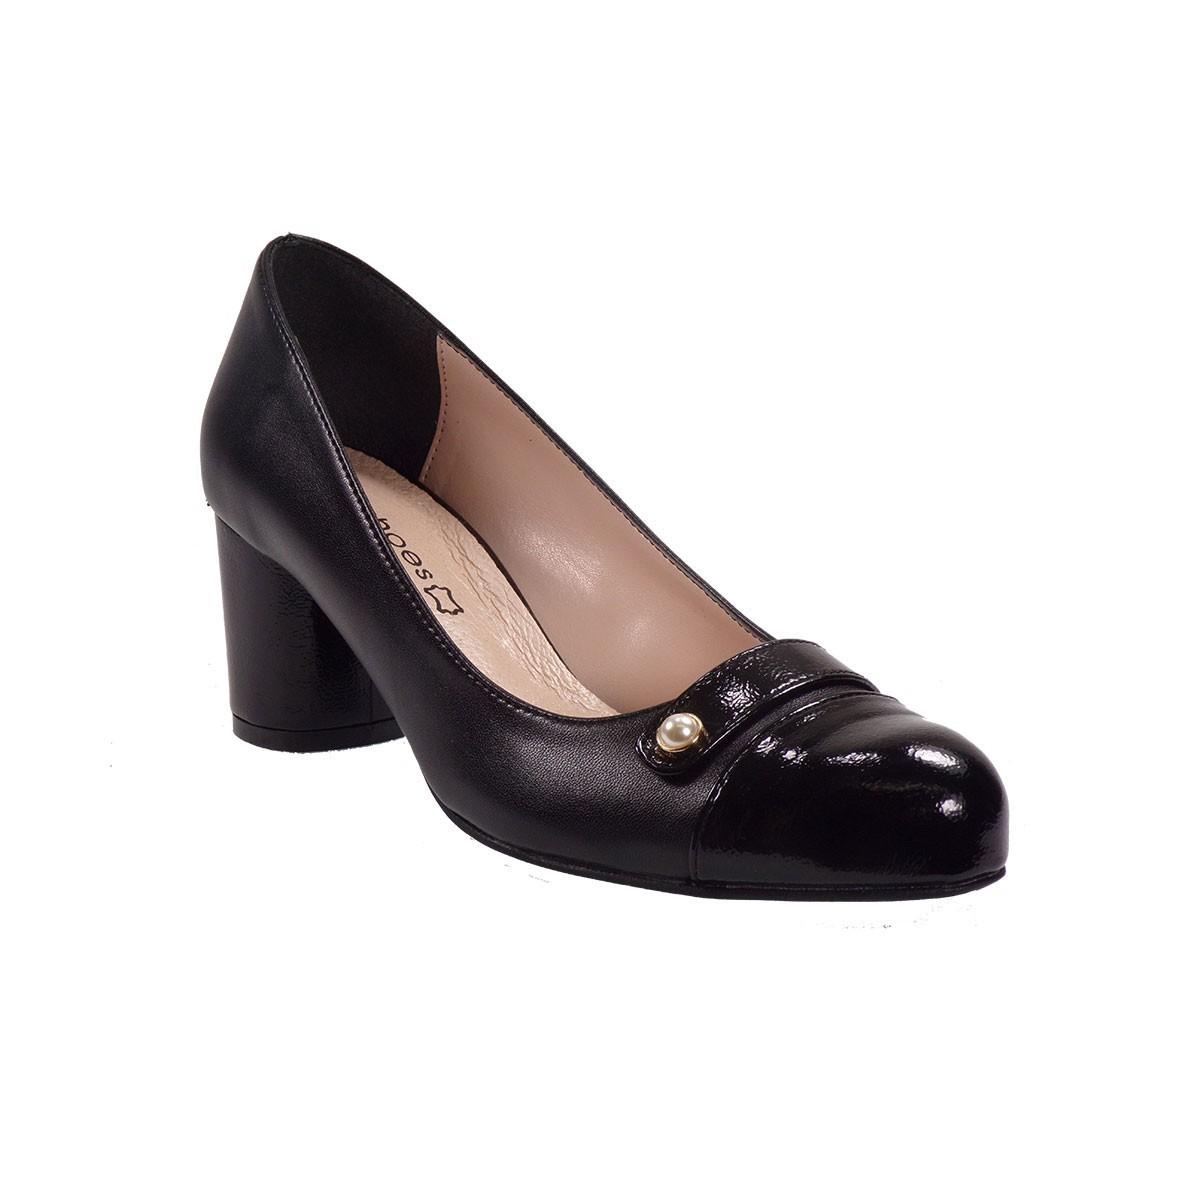 Katia Shoes Γυναικεία Παπούτσια Γόβες 18-5080 Μαύρο